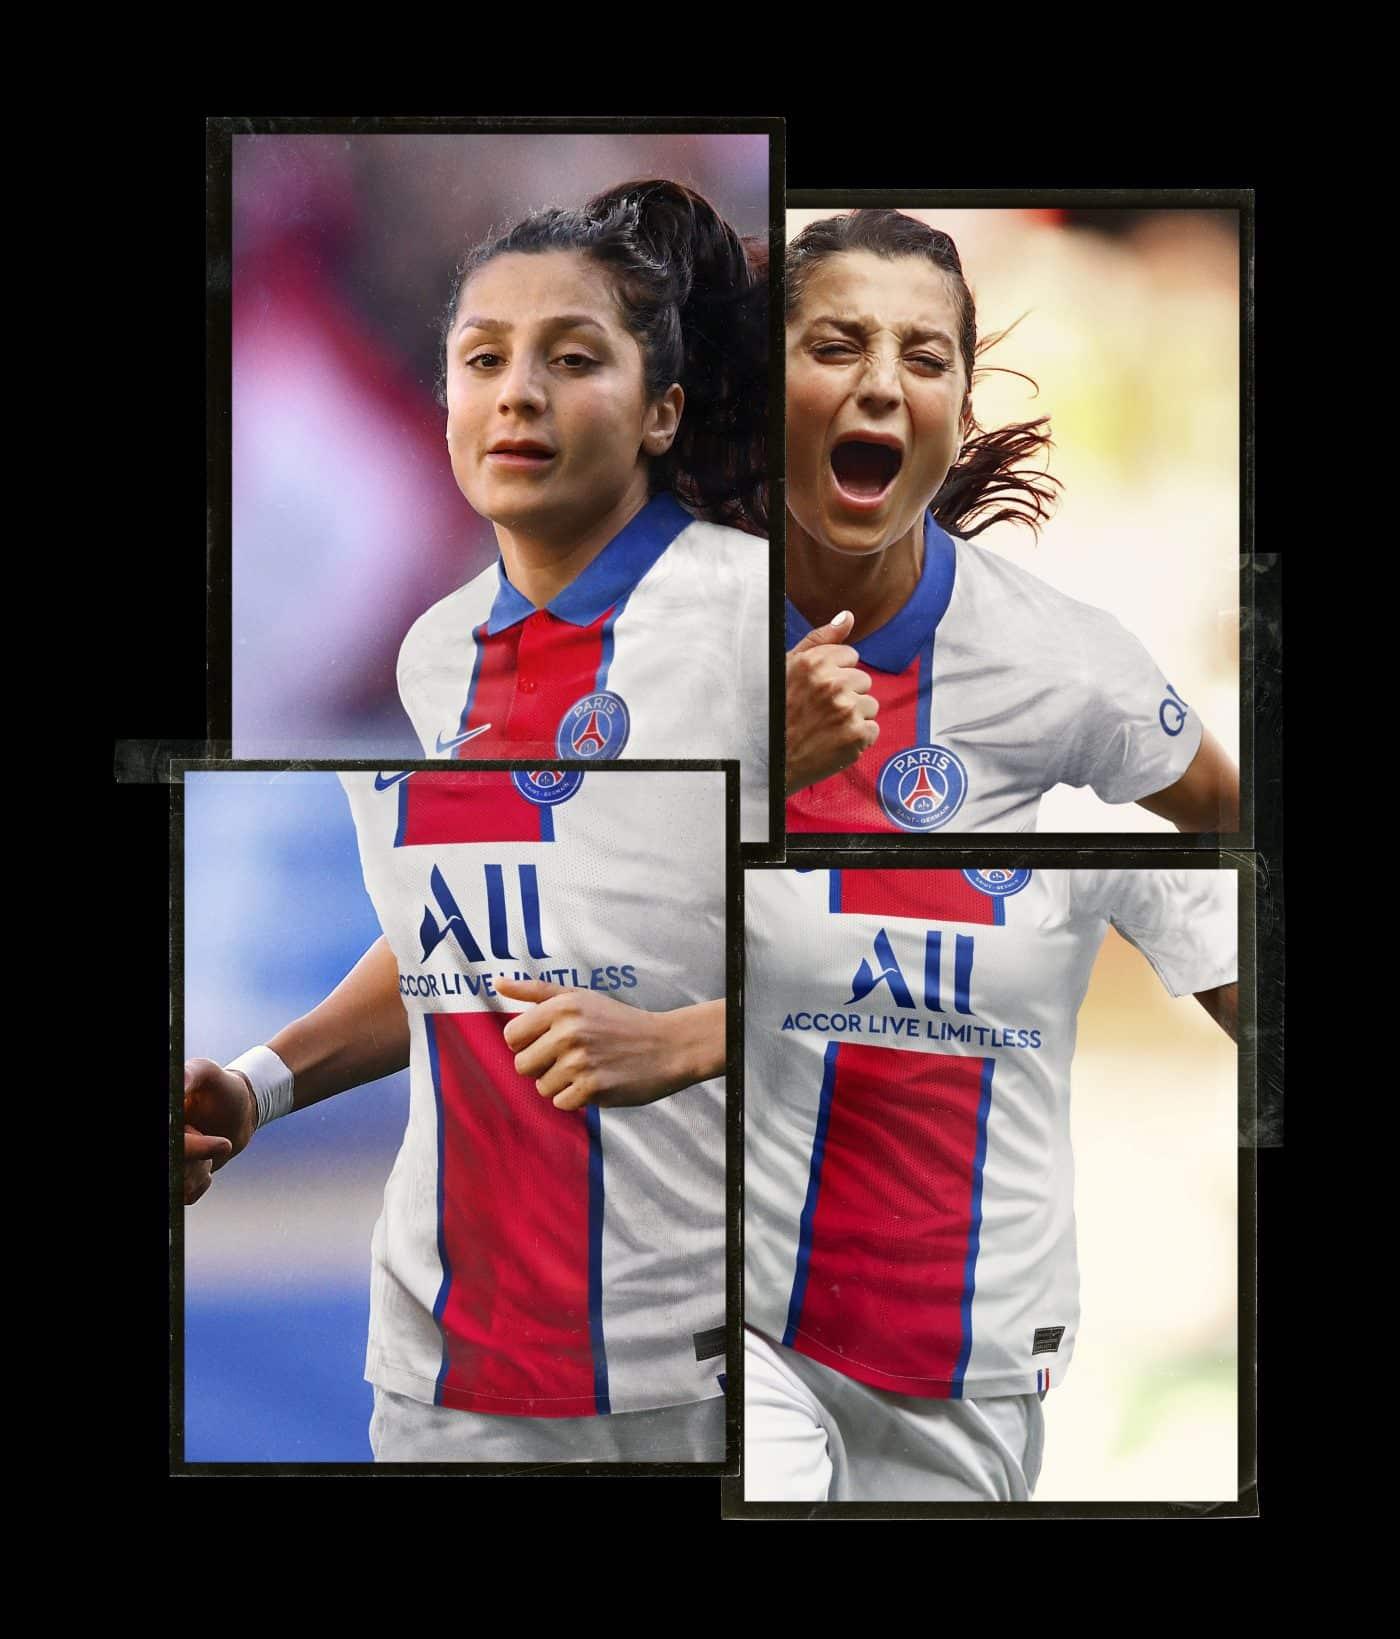 maillot-exterieur-psg-2020-2021-paris-saint-germain-nike-1